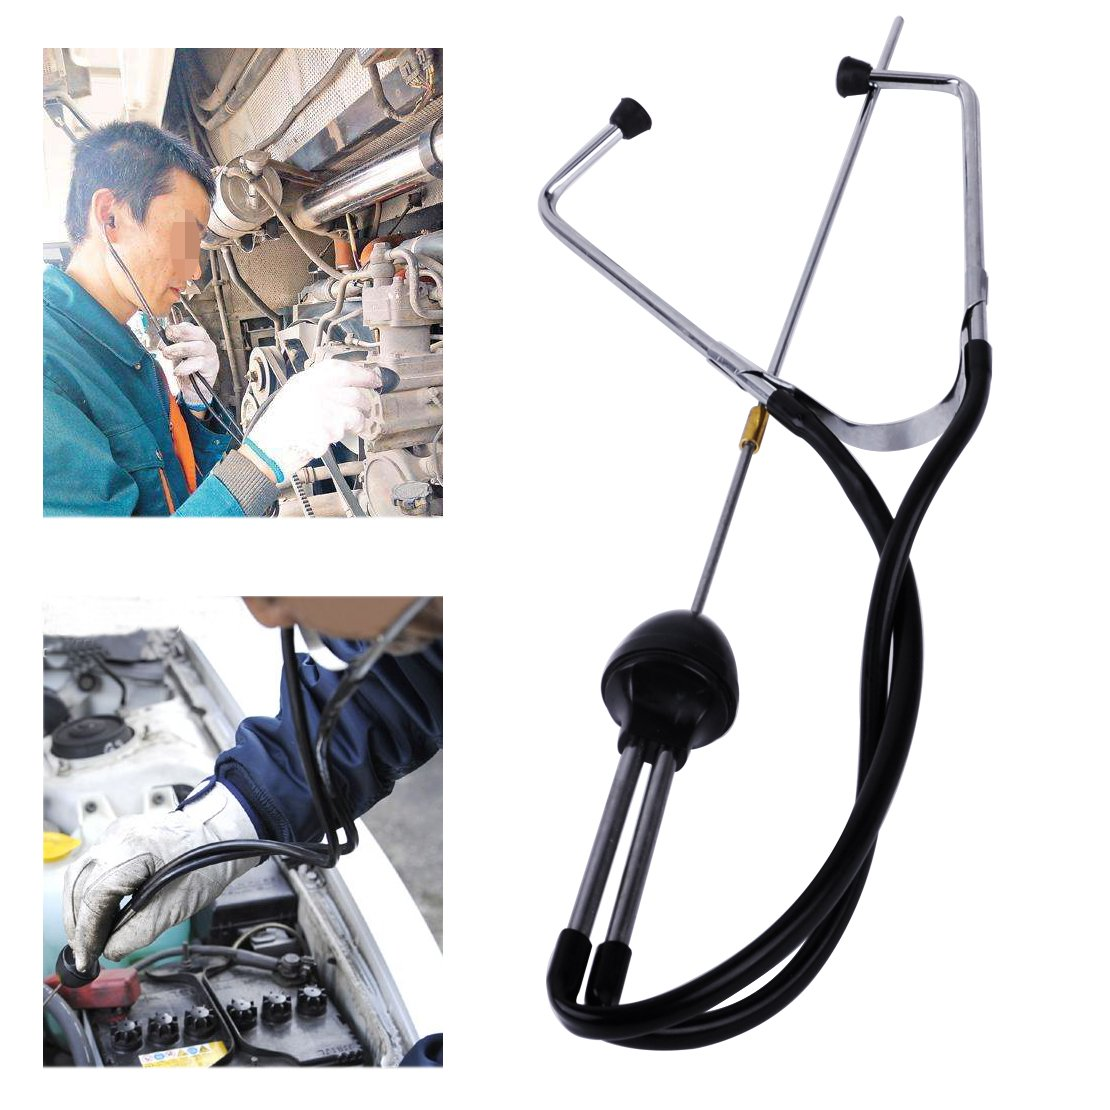 CITALL Car Engine Block Diagnostic Automotive Hearing Tool Auto Mechanics Stethoscope